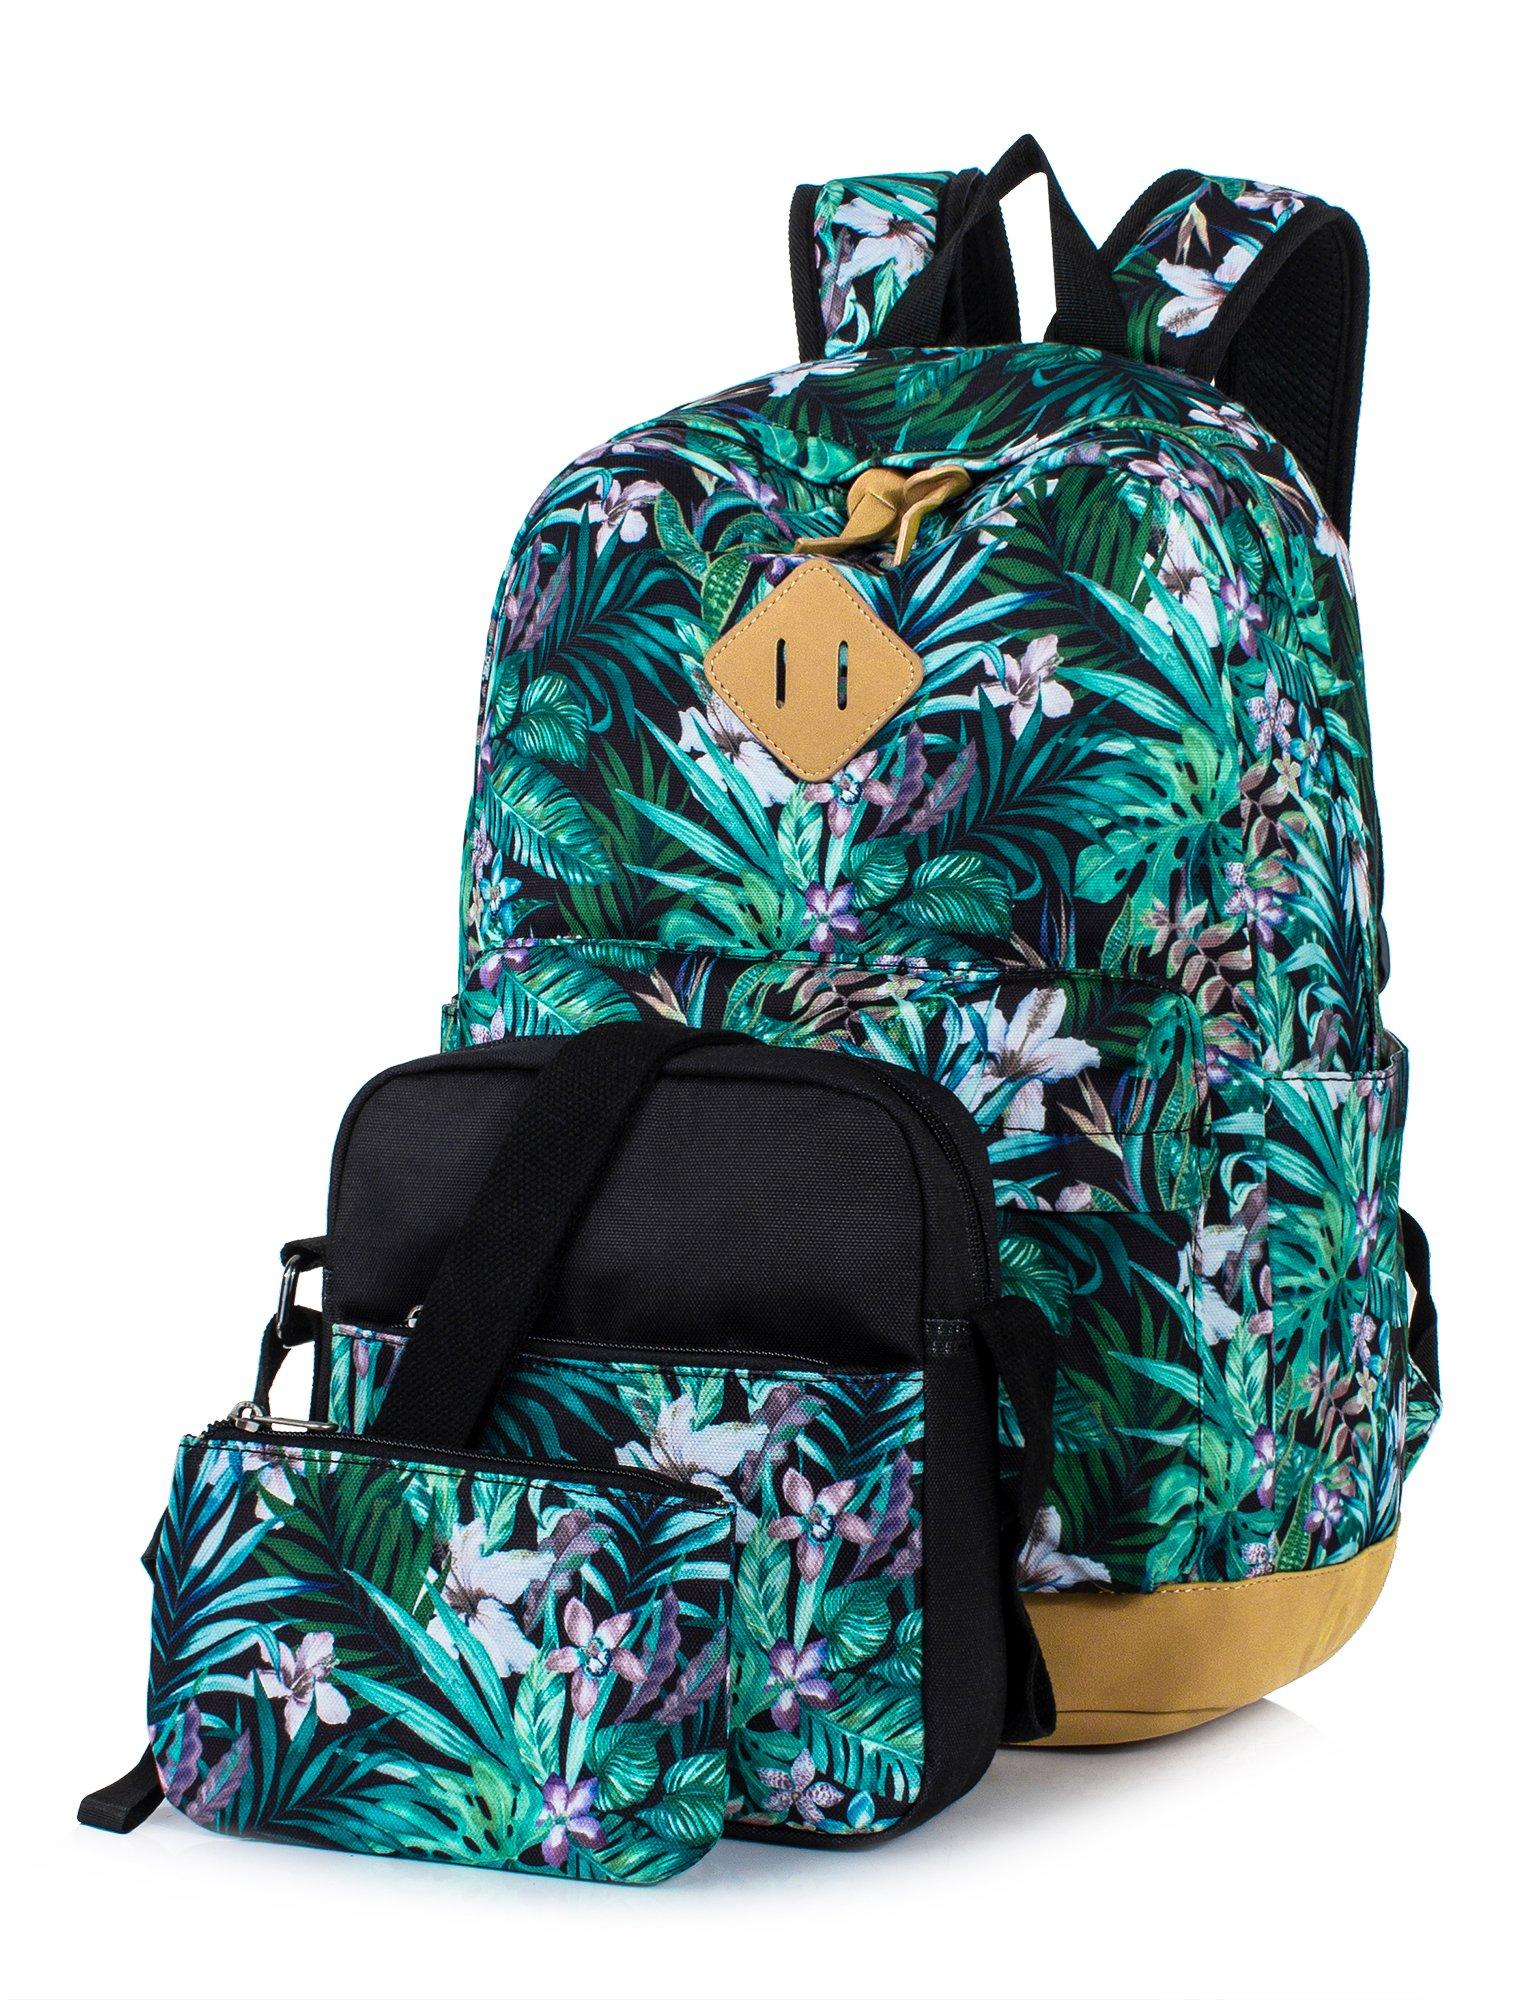 Leaper Floral Laptop Backpack School Travel Bags Shoulder Bag Purse Green 3PCS